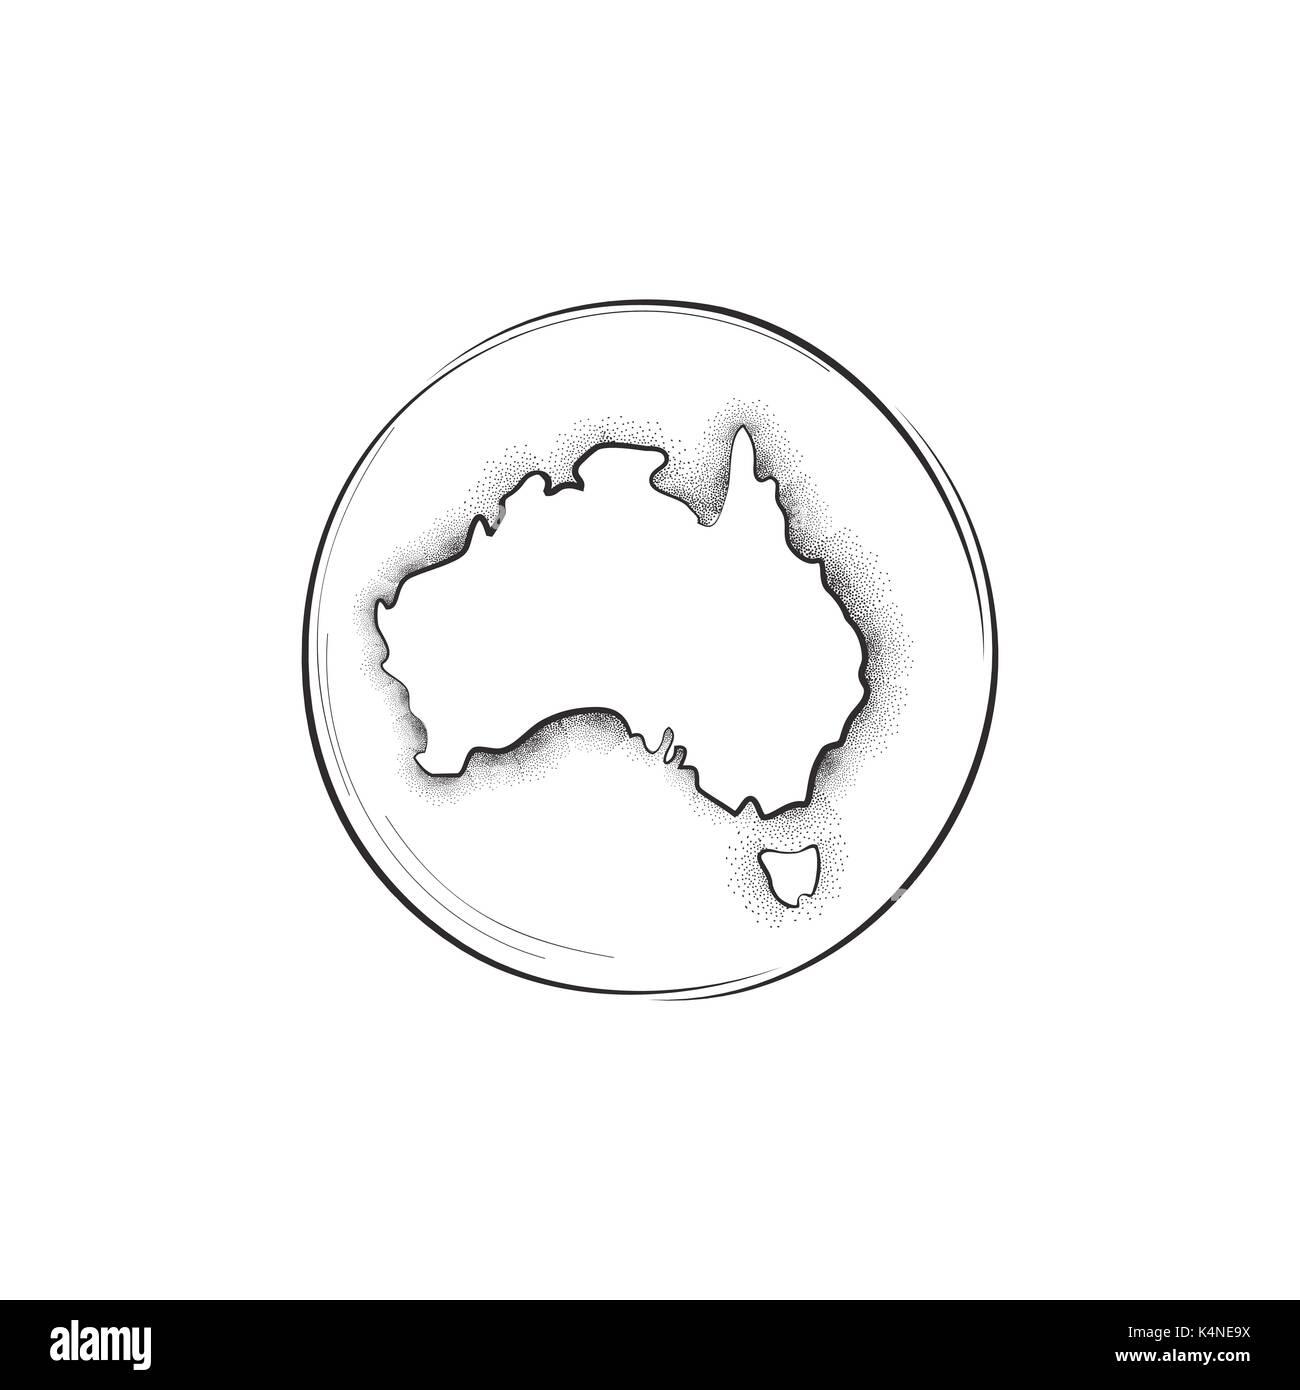 Australia. Retro map sign - Stock Image